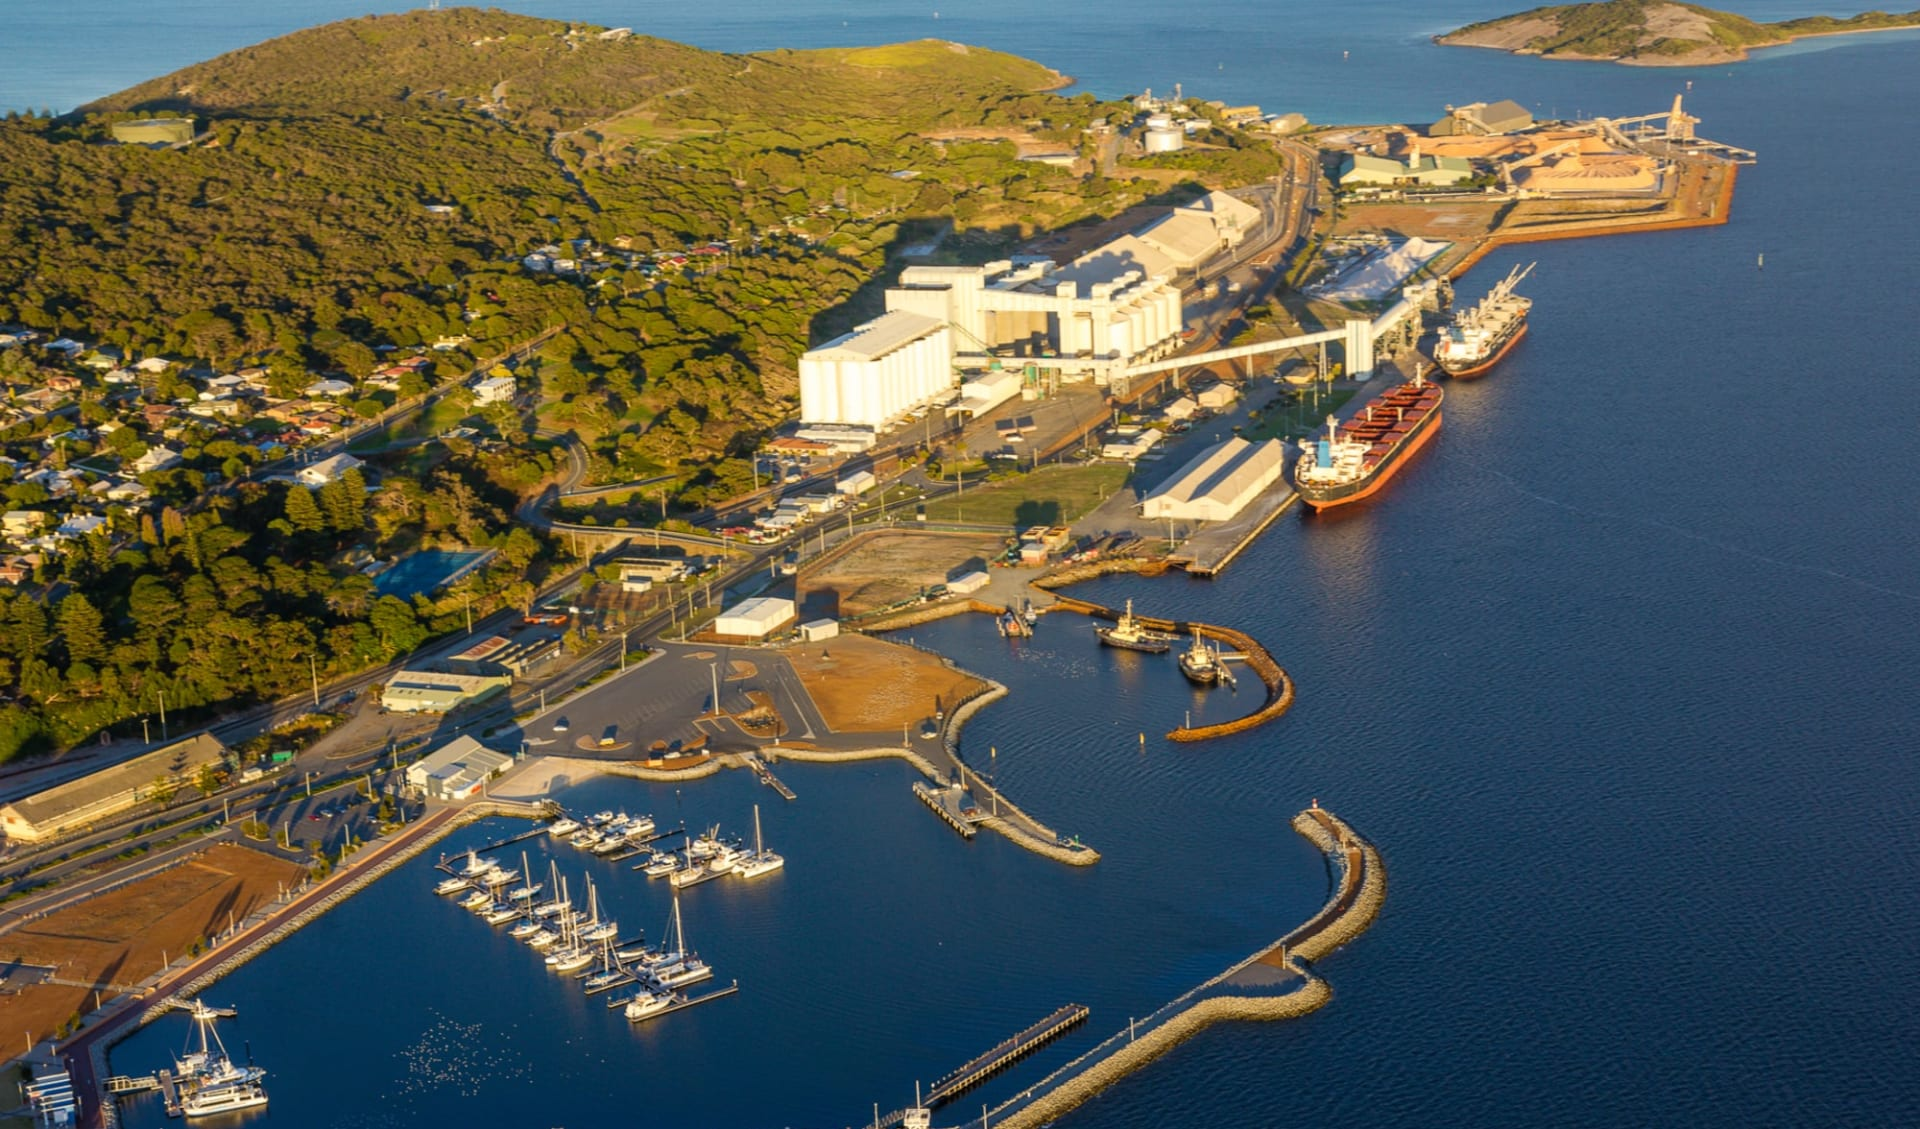 Western Beauty 5 Tage ab Perth: Albany